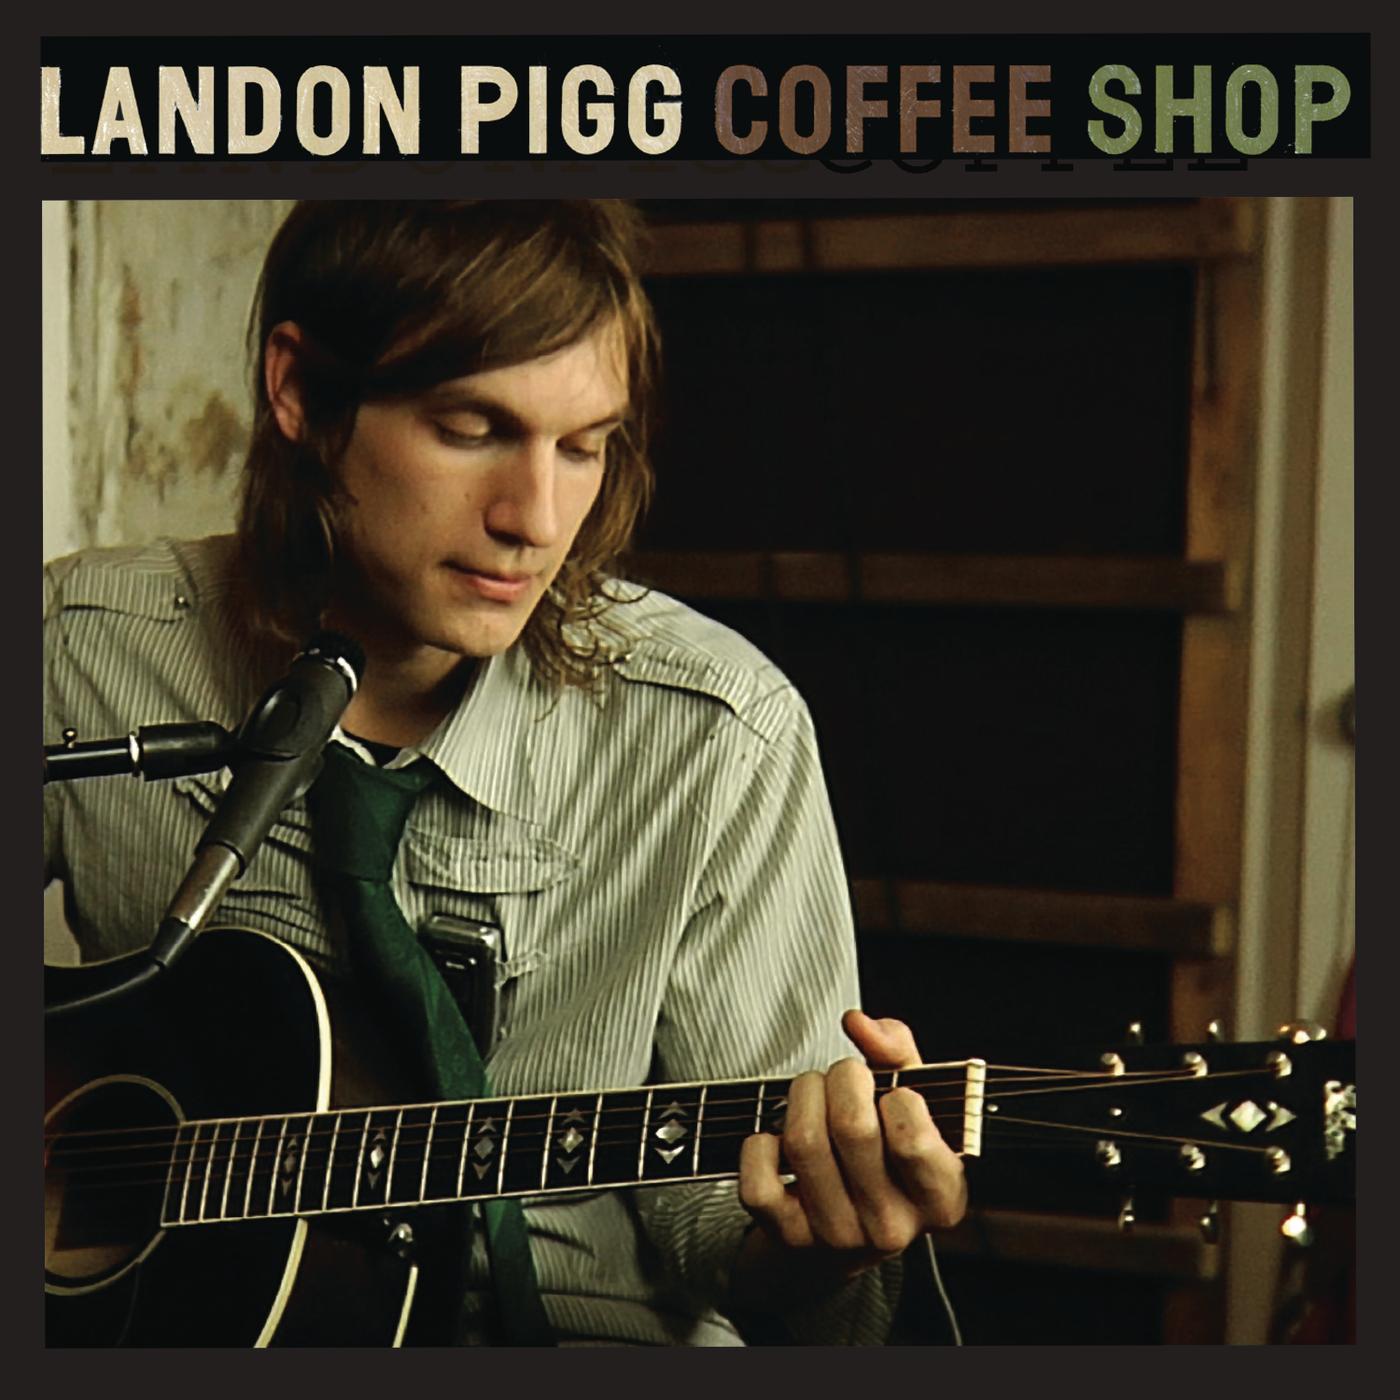 Coffee Shop - Landon Pigg